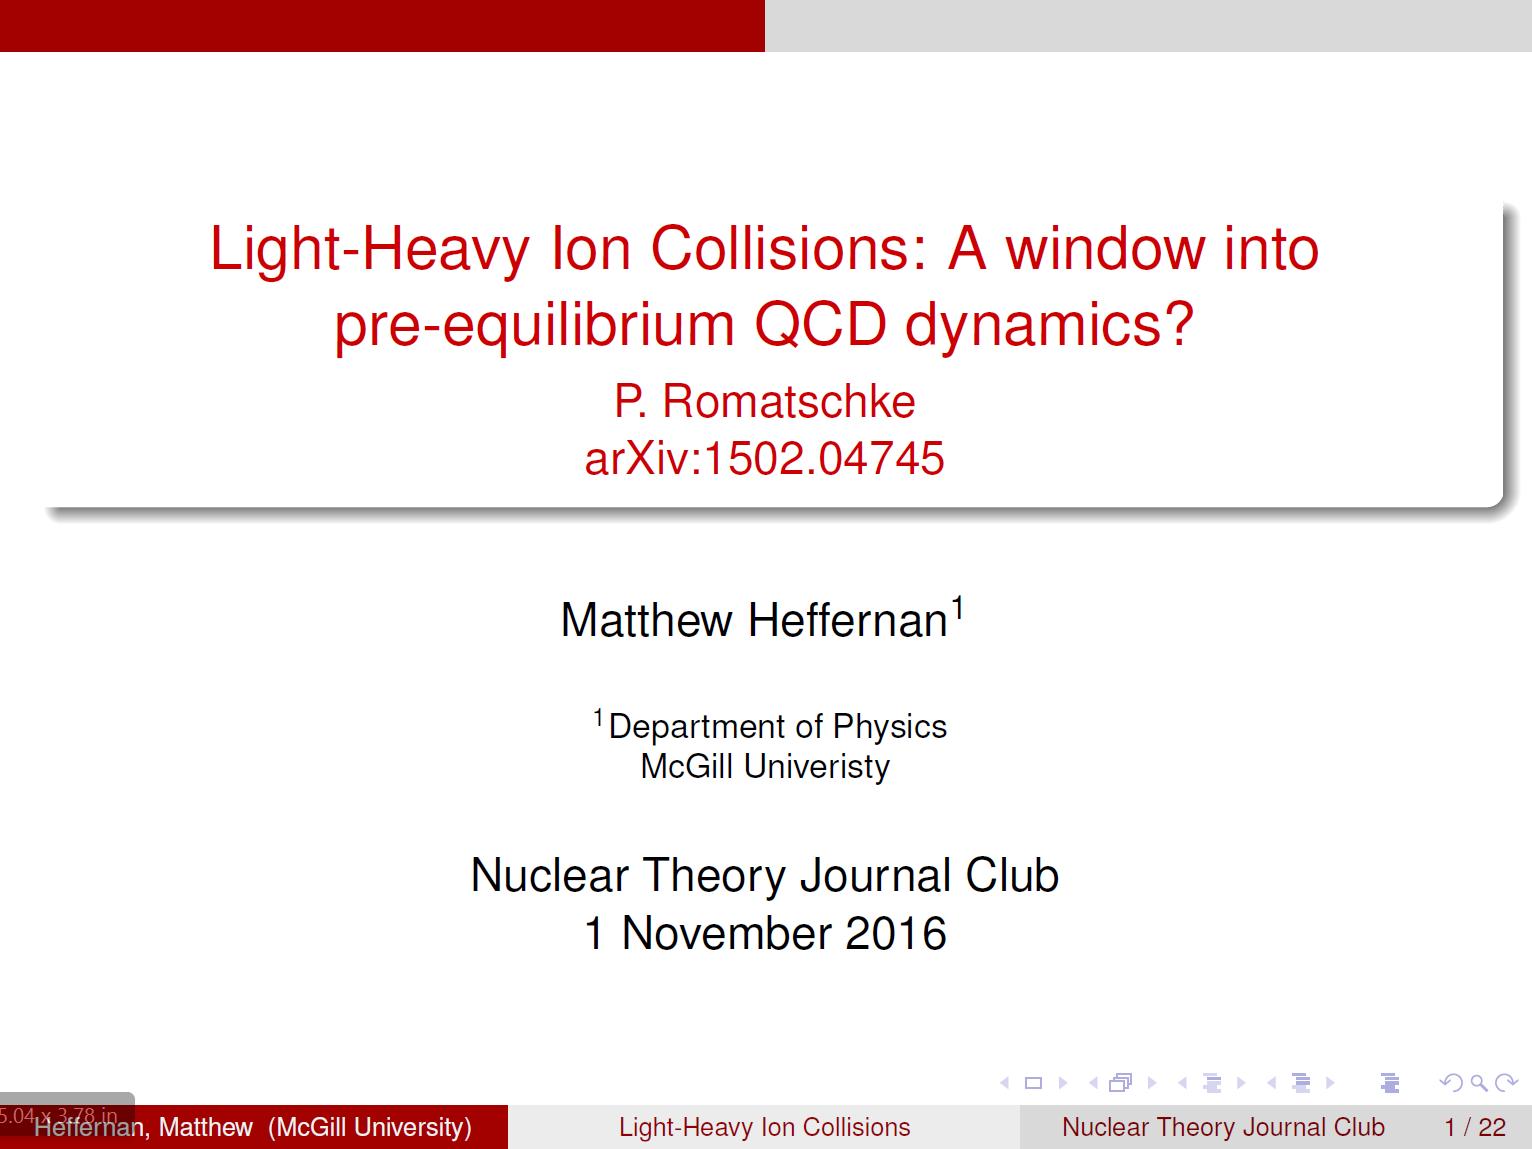 Matthew Heffernan | McGill University